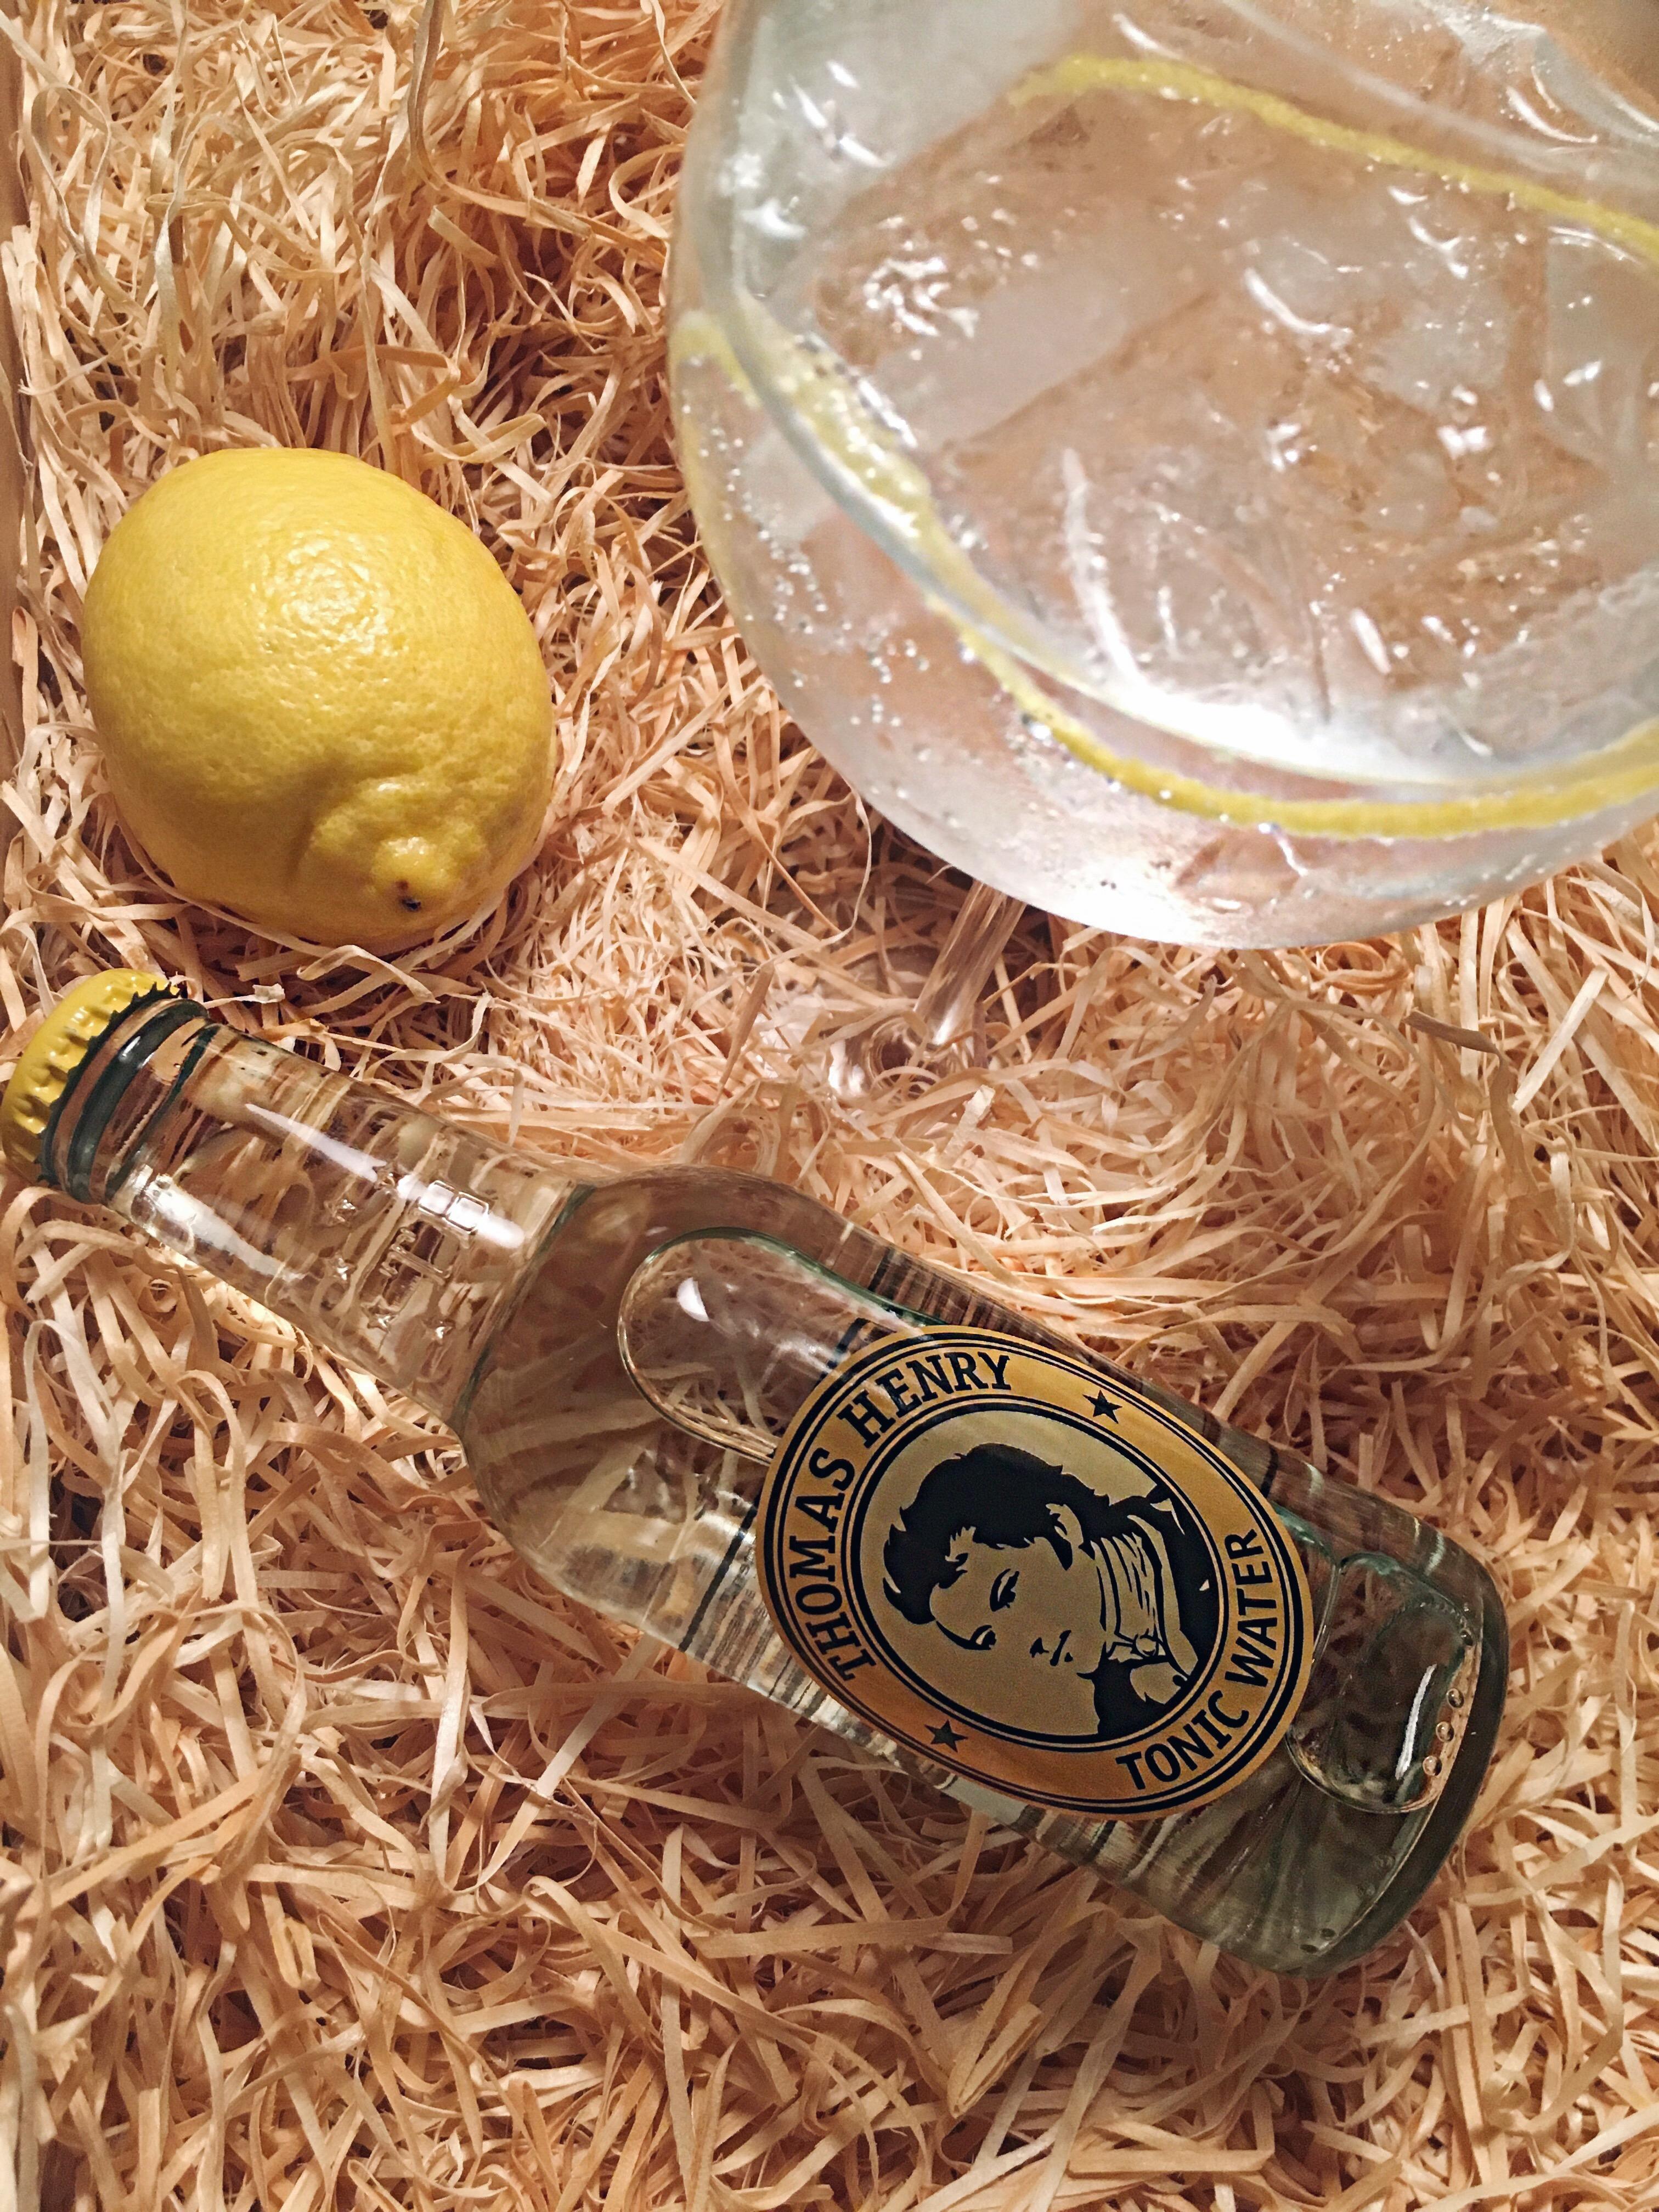 Fashioncircuz by Jenny gin-tonic DAS PERFEKTE DINNER MIT THOMAS HENRY UND G'VINE